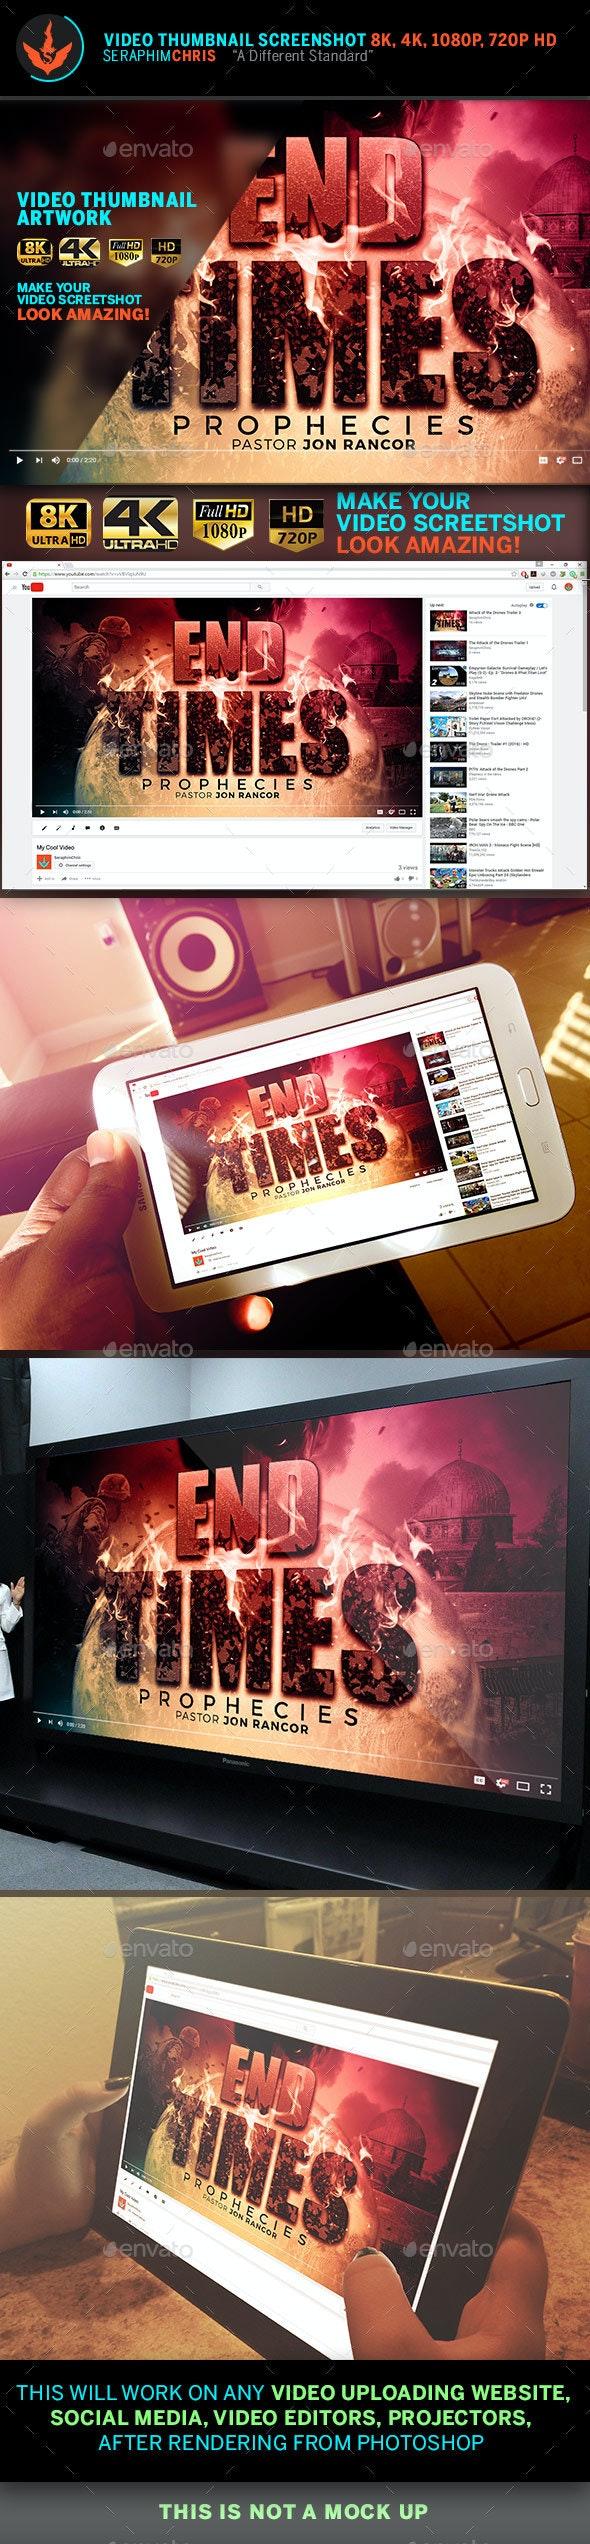 End Time Prophecies YouTube Thumbnail Screenshot Template - YouTube Social Media